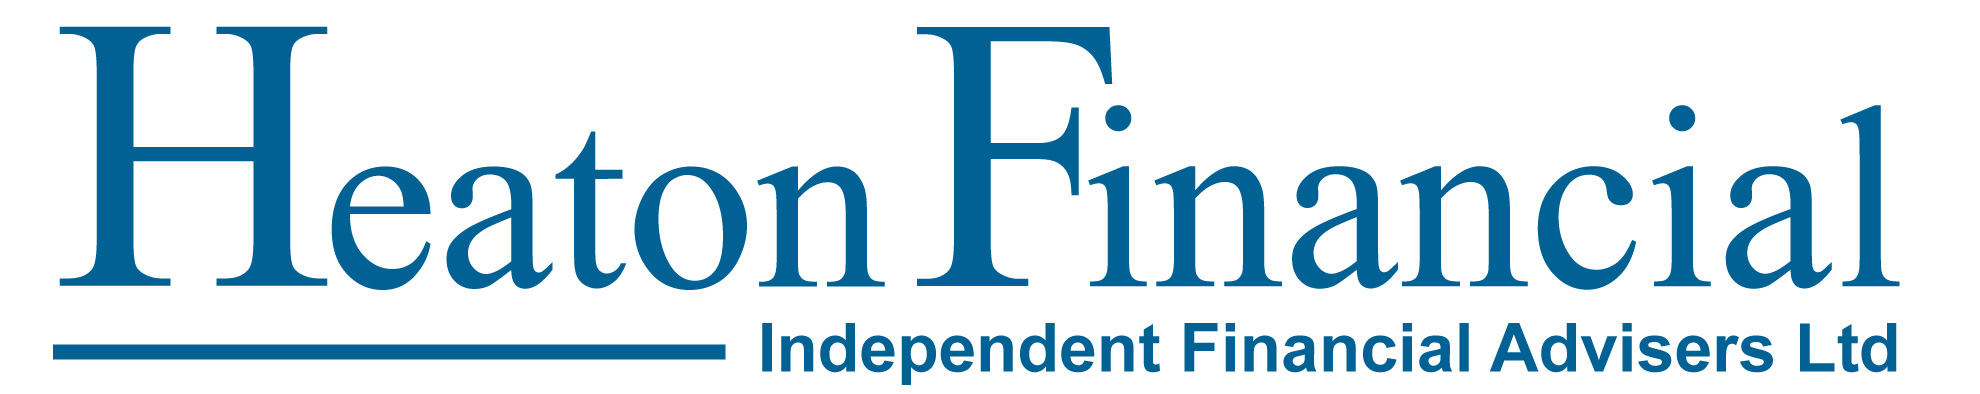 Heaton Financial Independent Financial Advisers Ltd